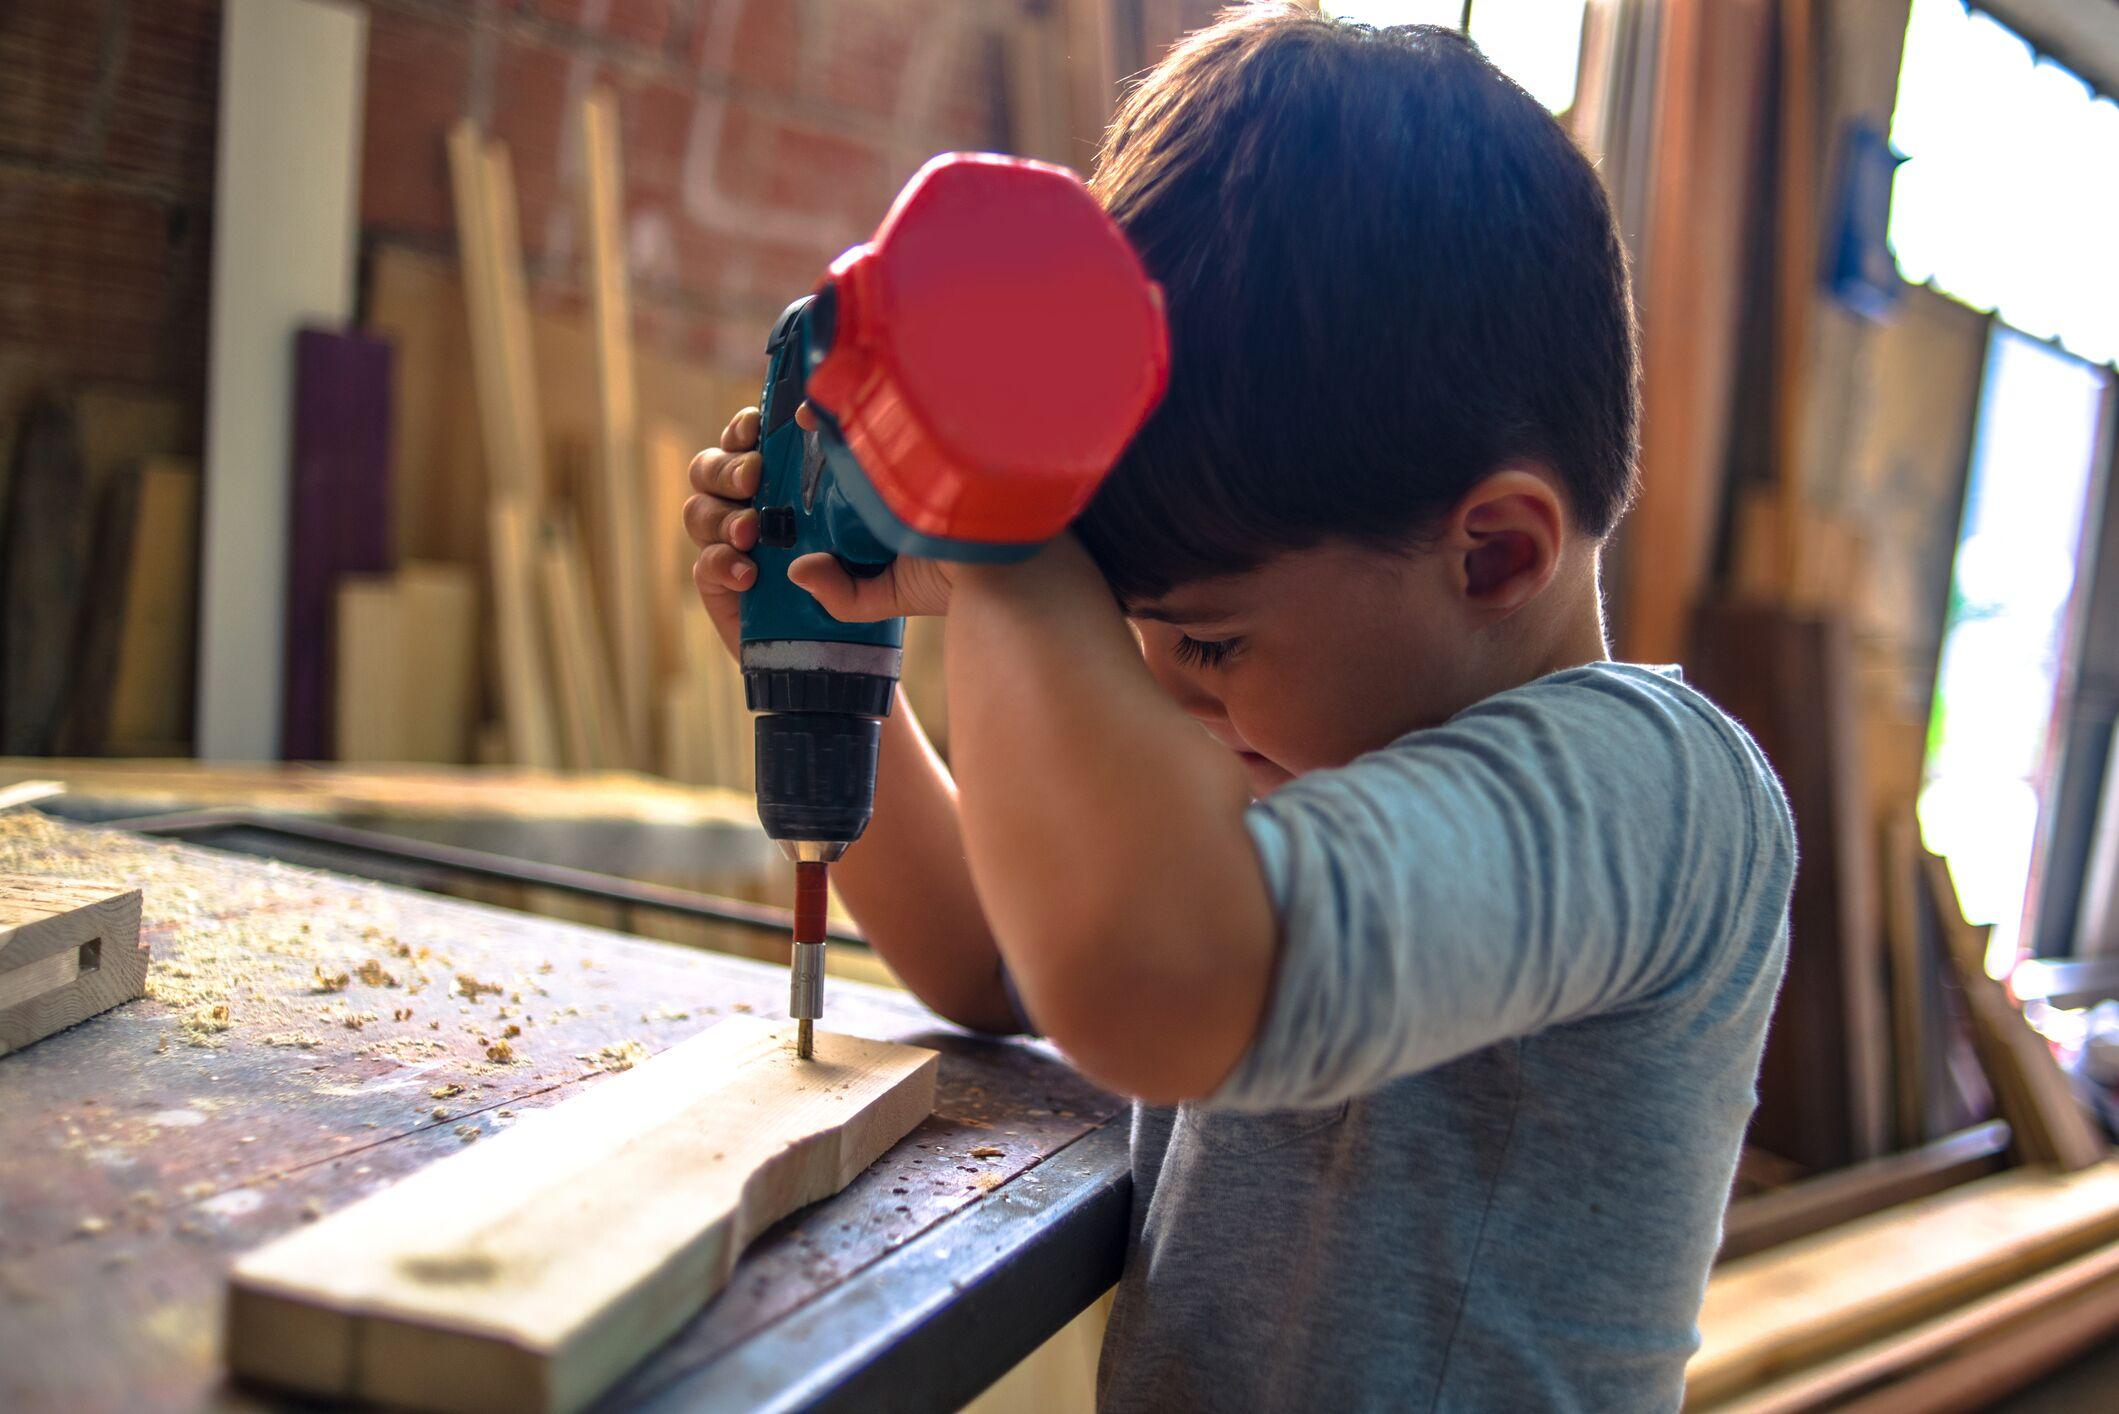 child-using-power-tool.jpeg?mtime=20200306090129#asset:16692